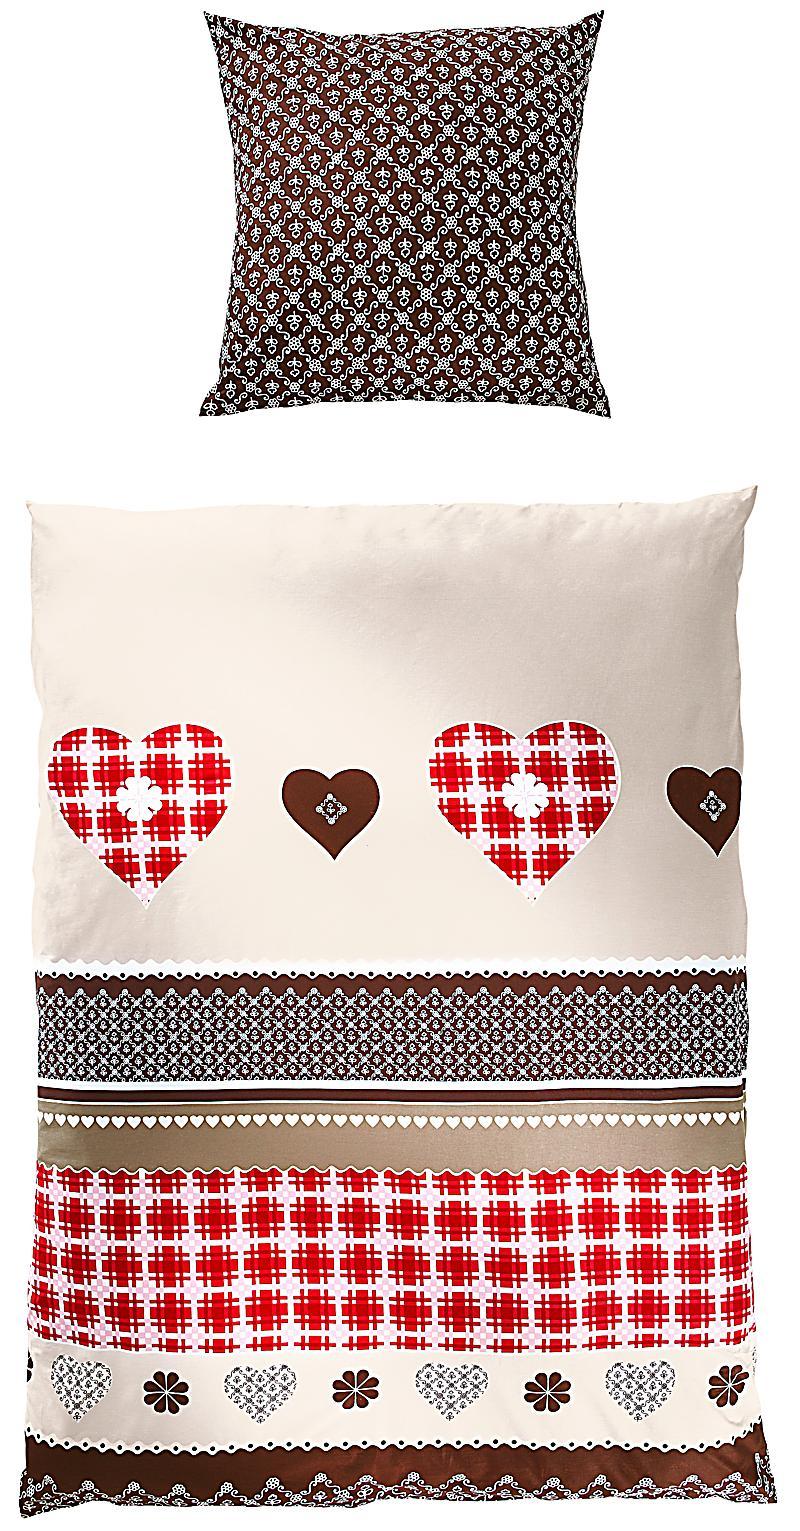 bettw sche kitzb hel gr sse 155 x 220 cm bestellen. Black Bedroom Furniture Sets. Home Design Ideas